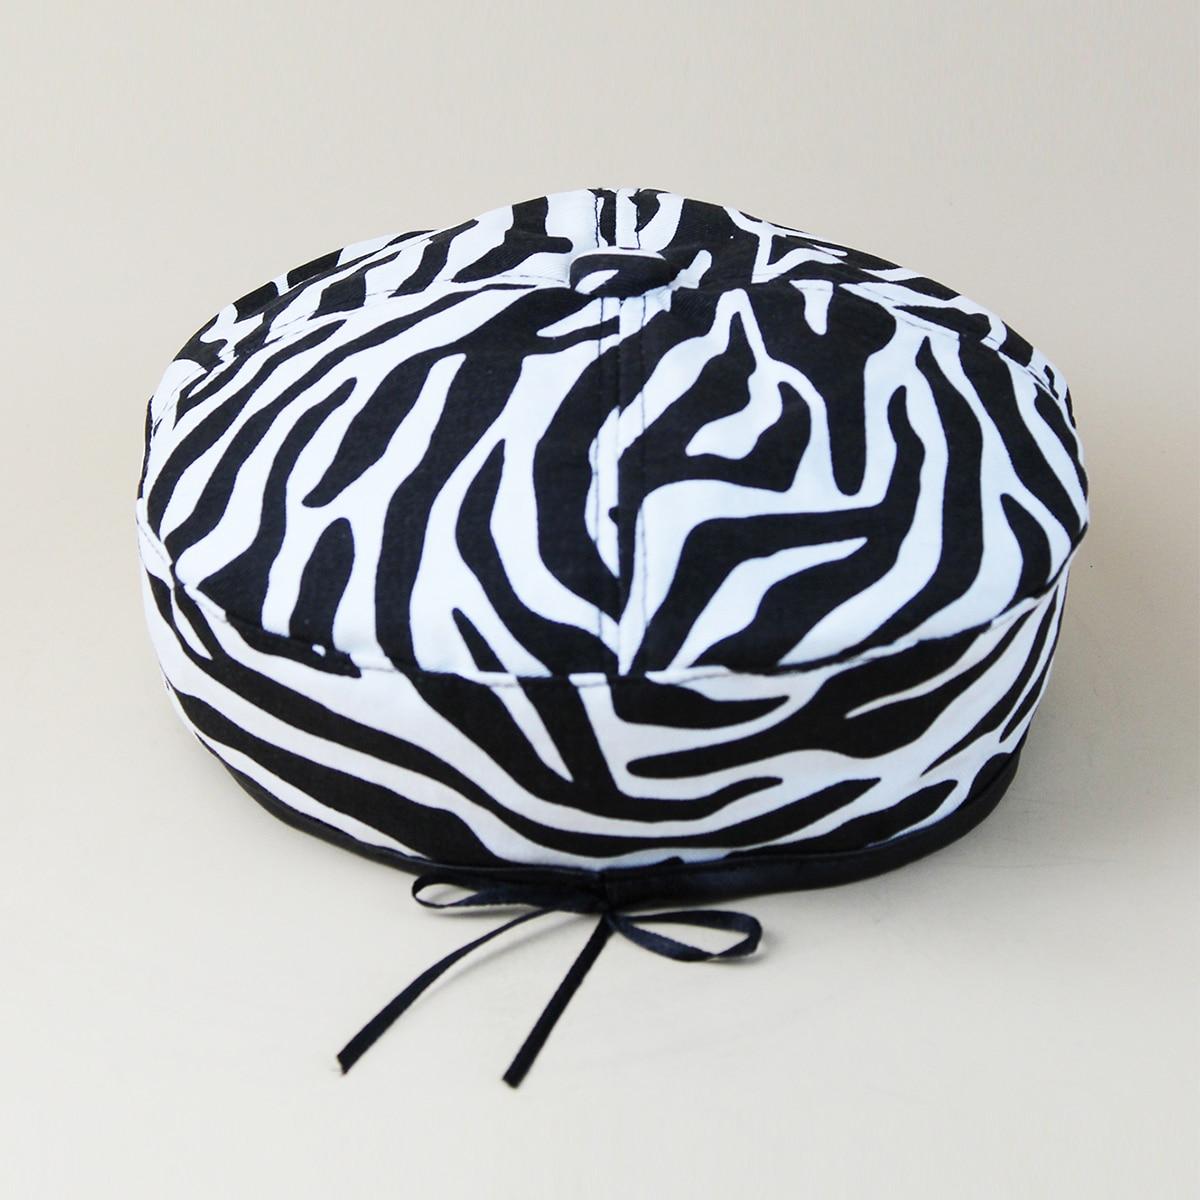 Берет с рисунком зебры от SHEIN